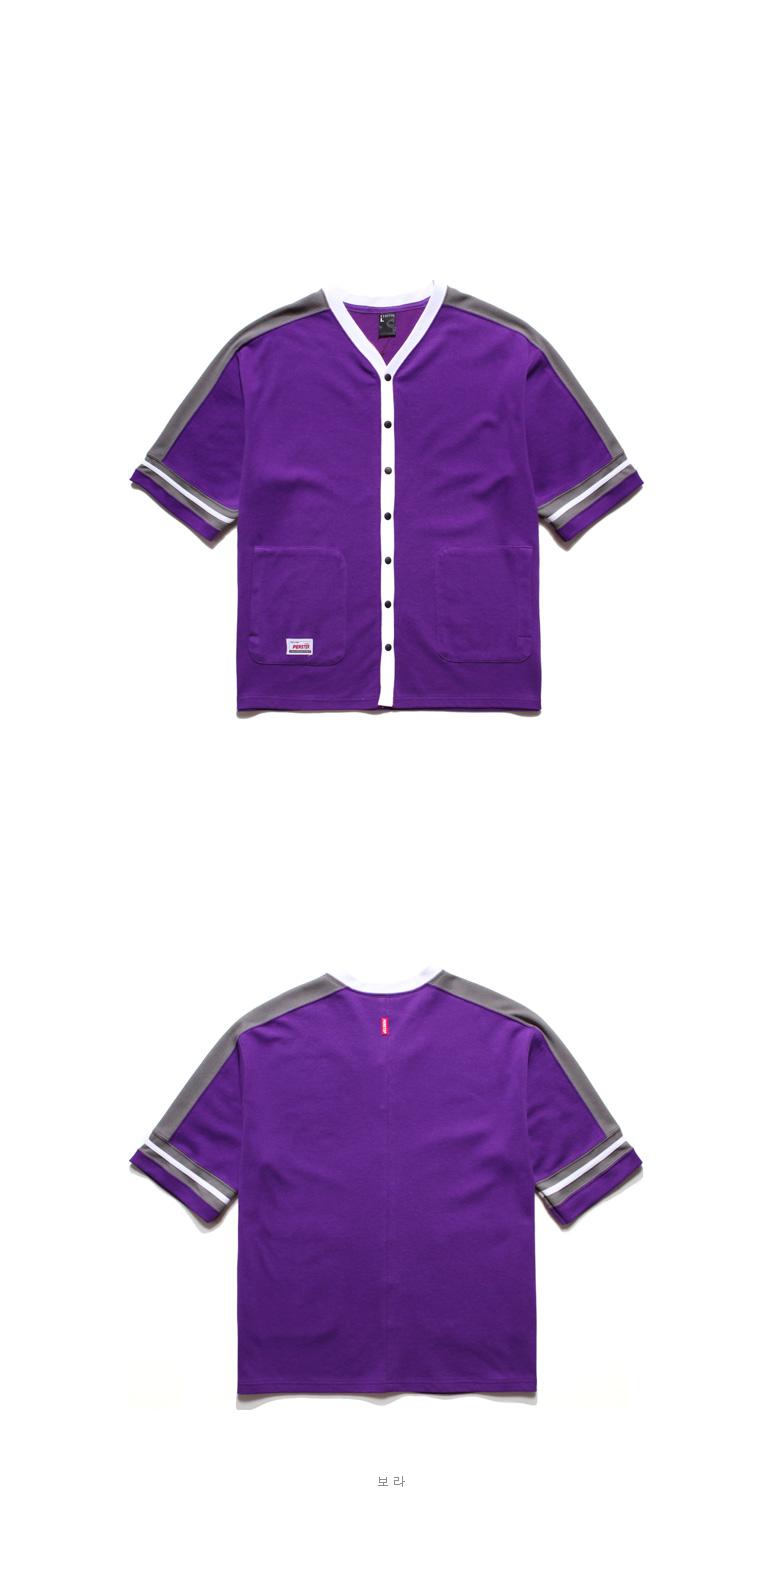 20180509_ps_bridge_purple_uk_01.jpg